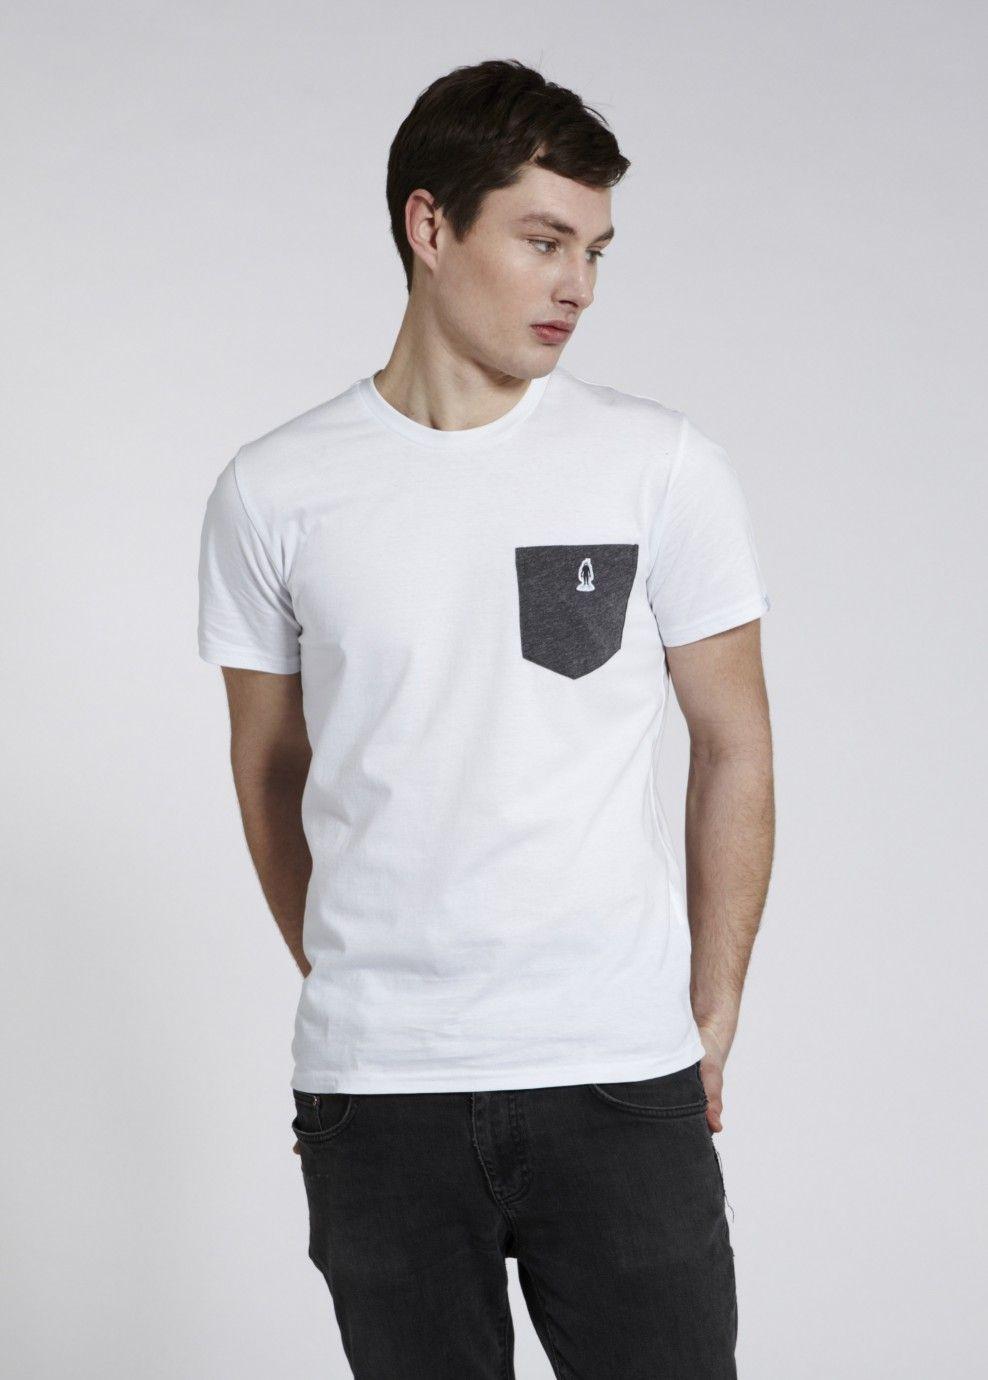 Plongée Clothing | Tee de Poche Diamond - T-shirts - Menswear